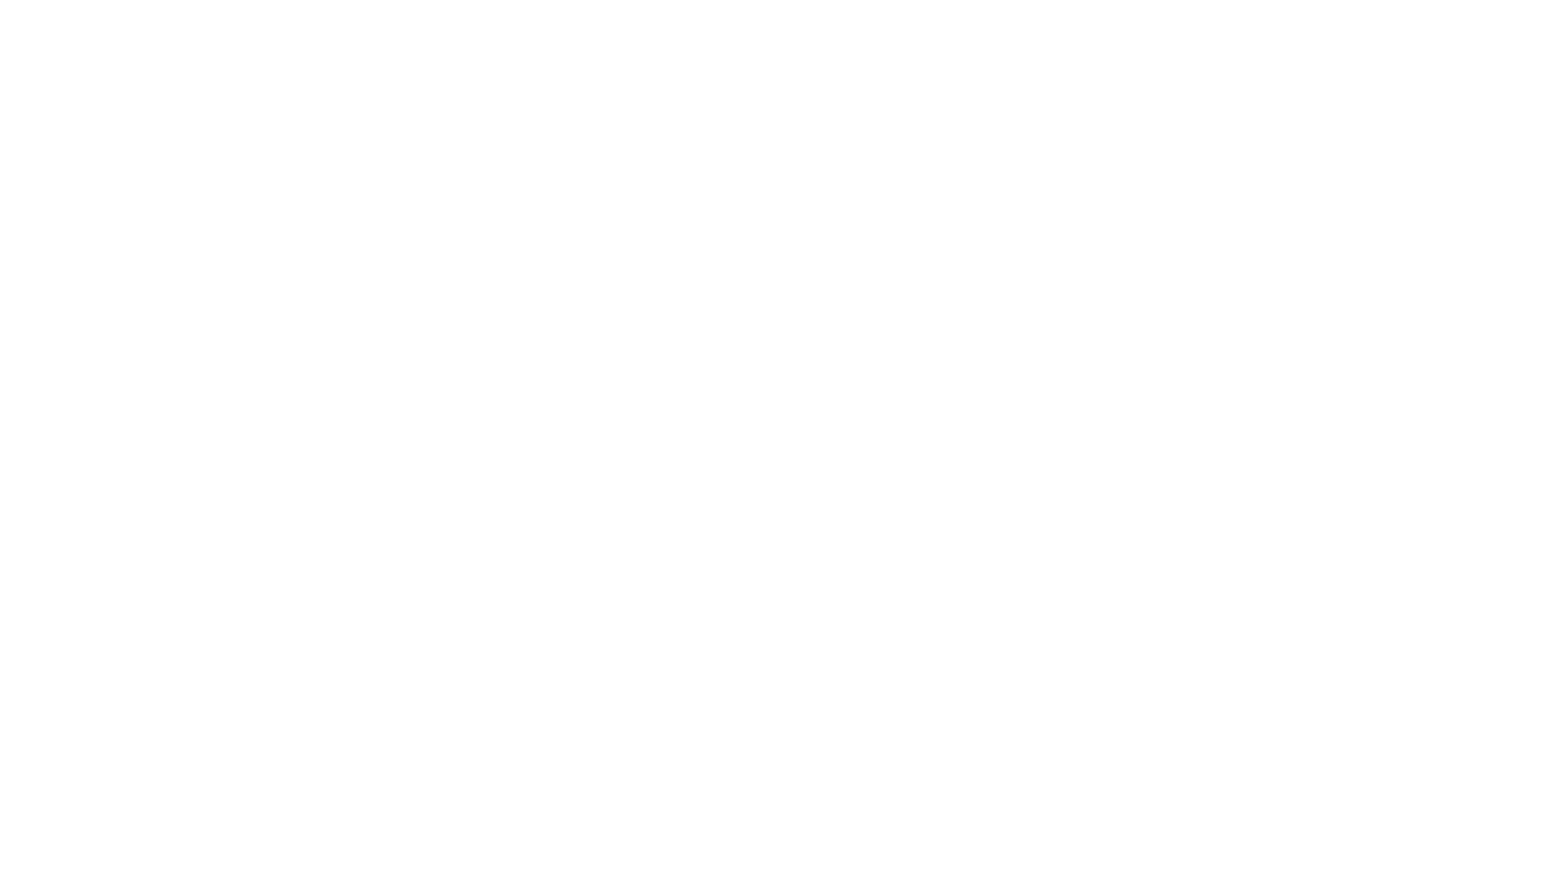 Rocketbook Axis: Smart, Reusable, & Customizable Notebook